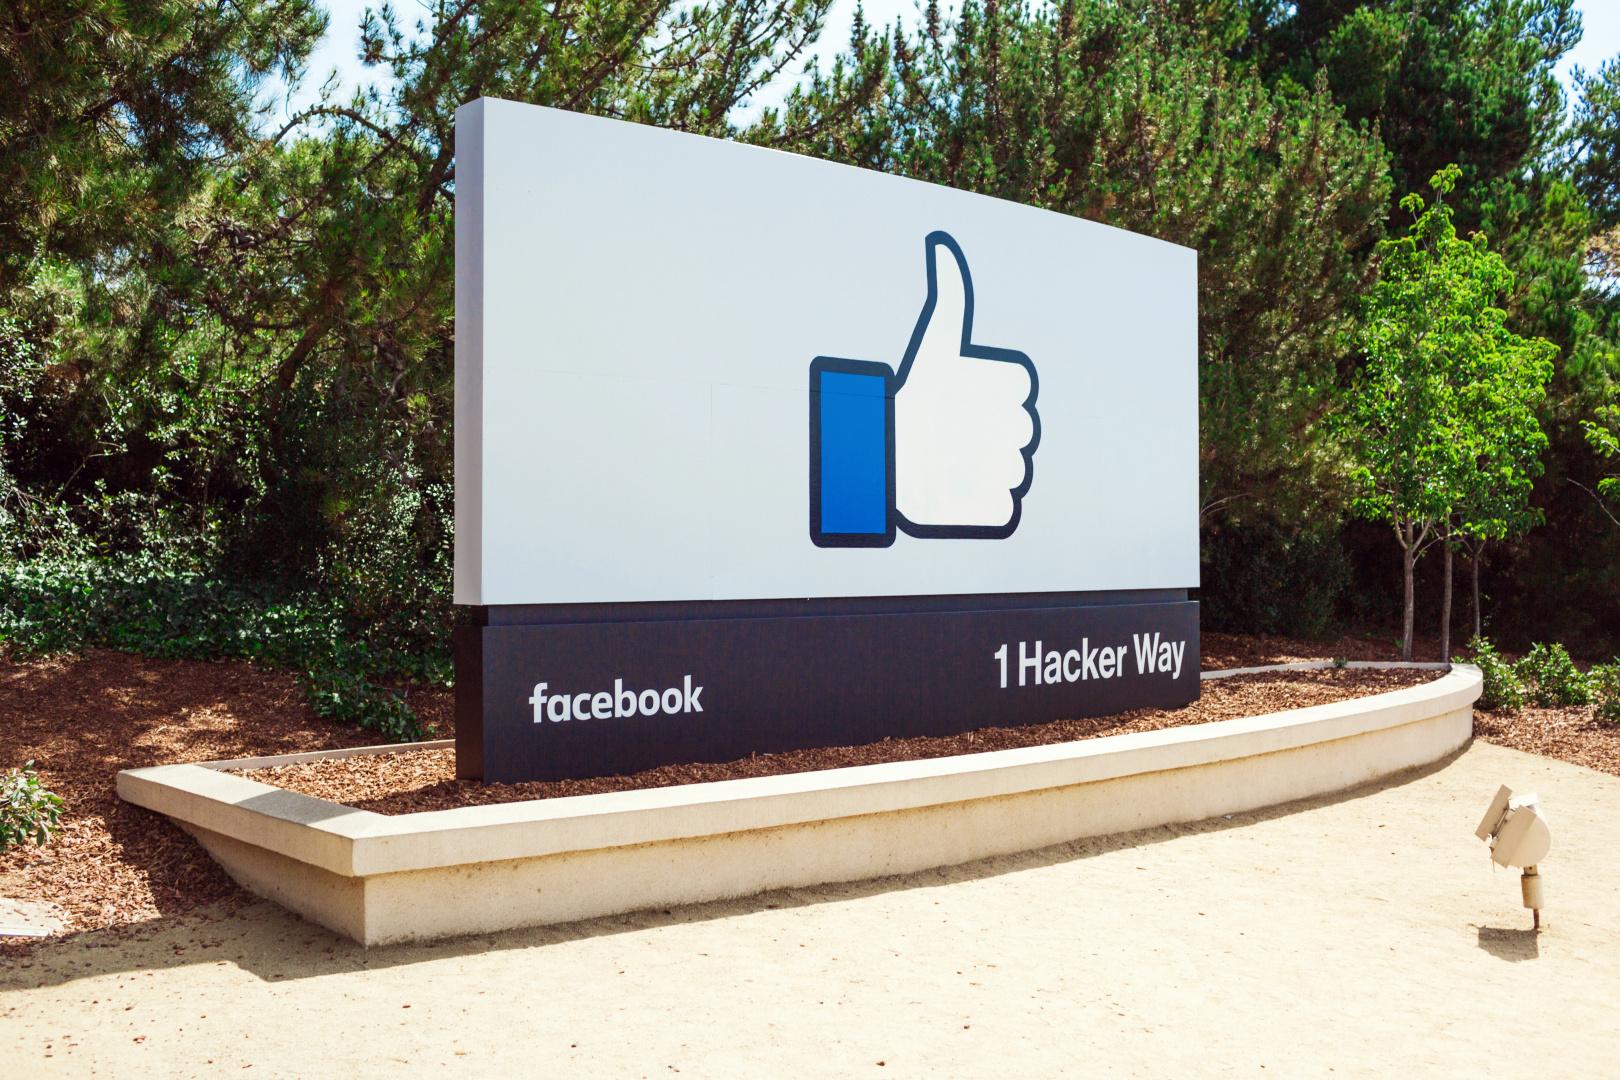 Zuckerberg sa nei til Microsoft.